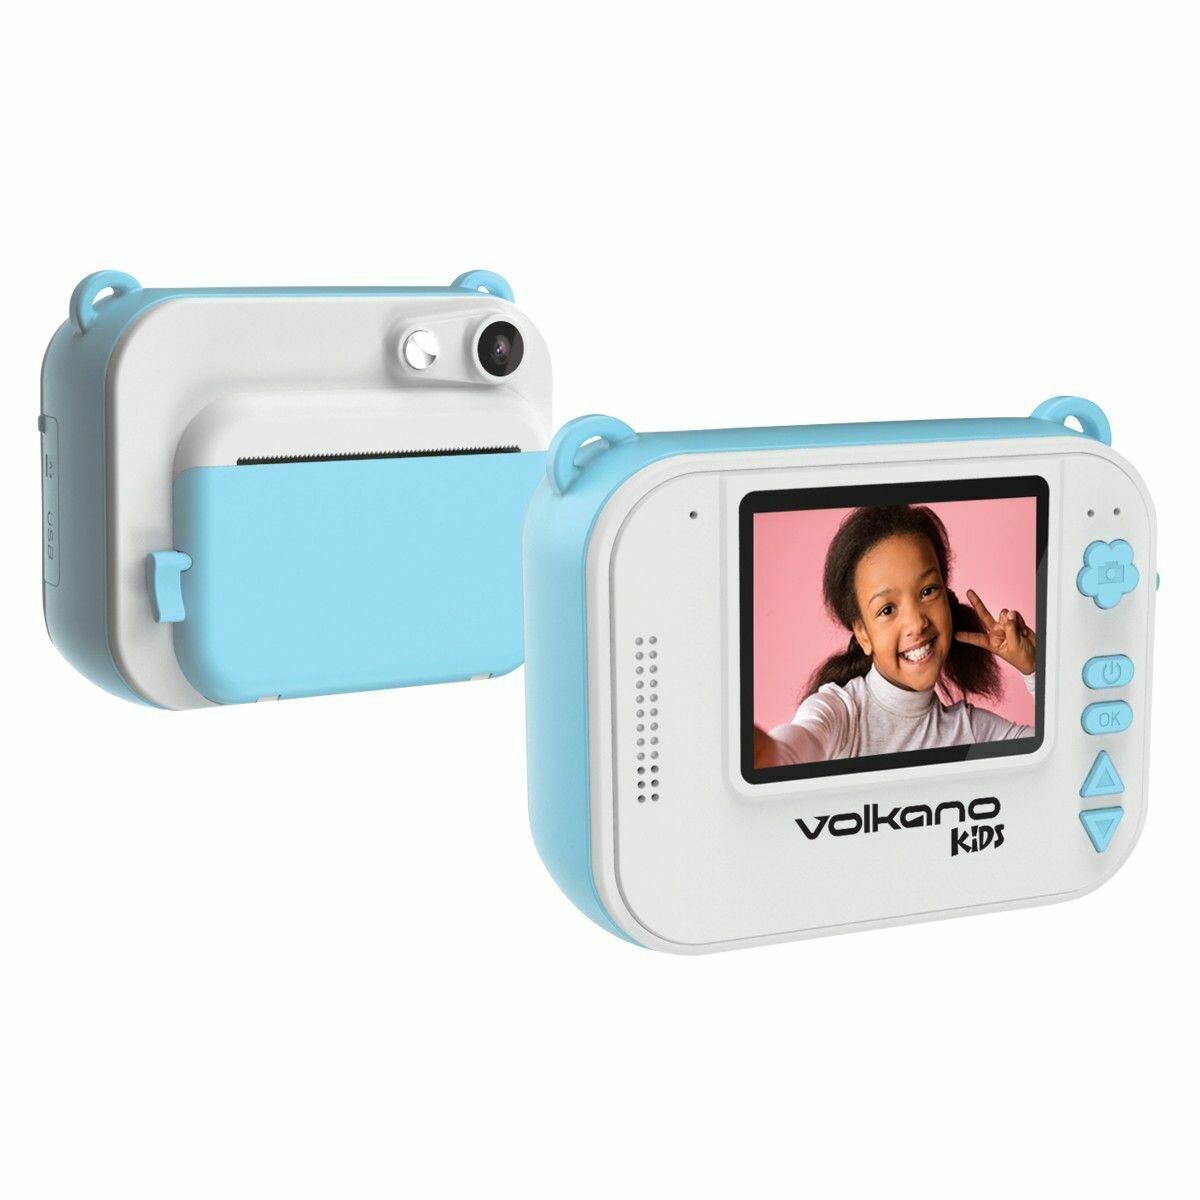 Volkano Kids Pronto series Instant Digital Camera